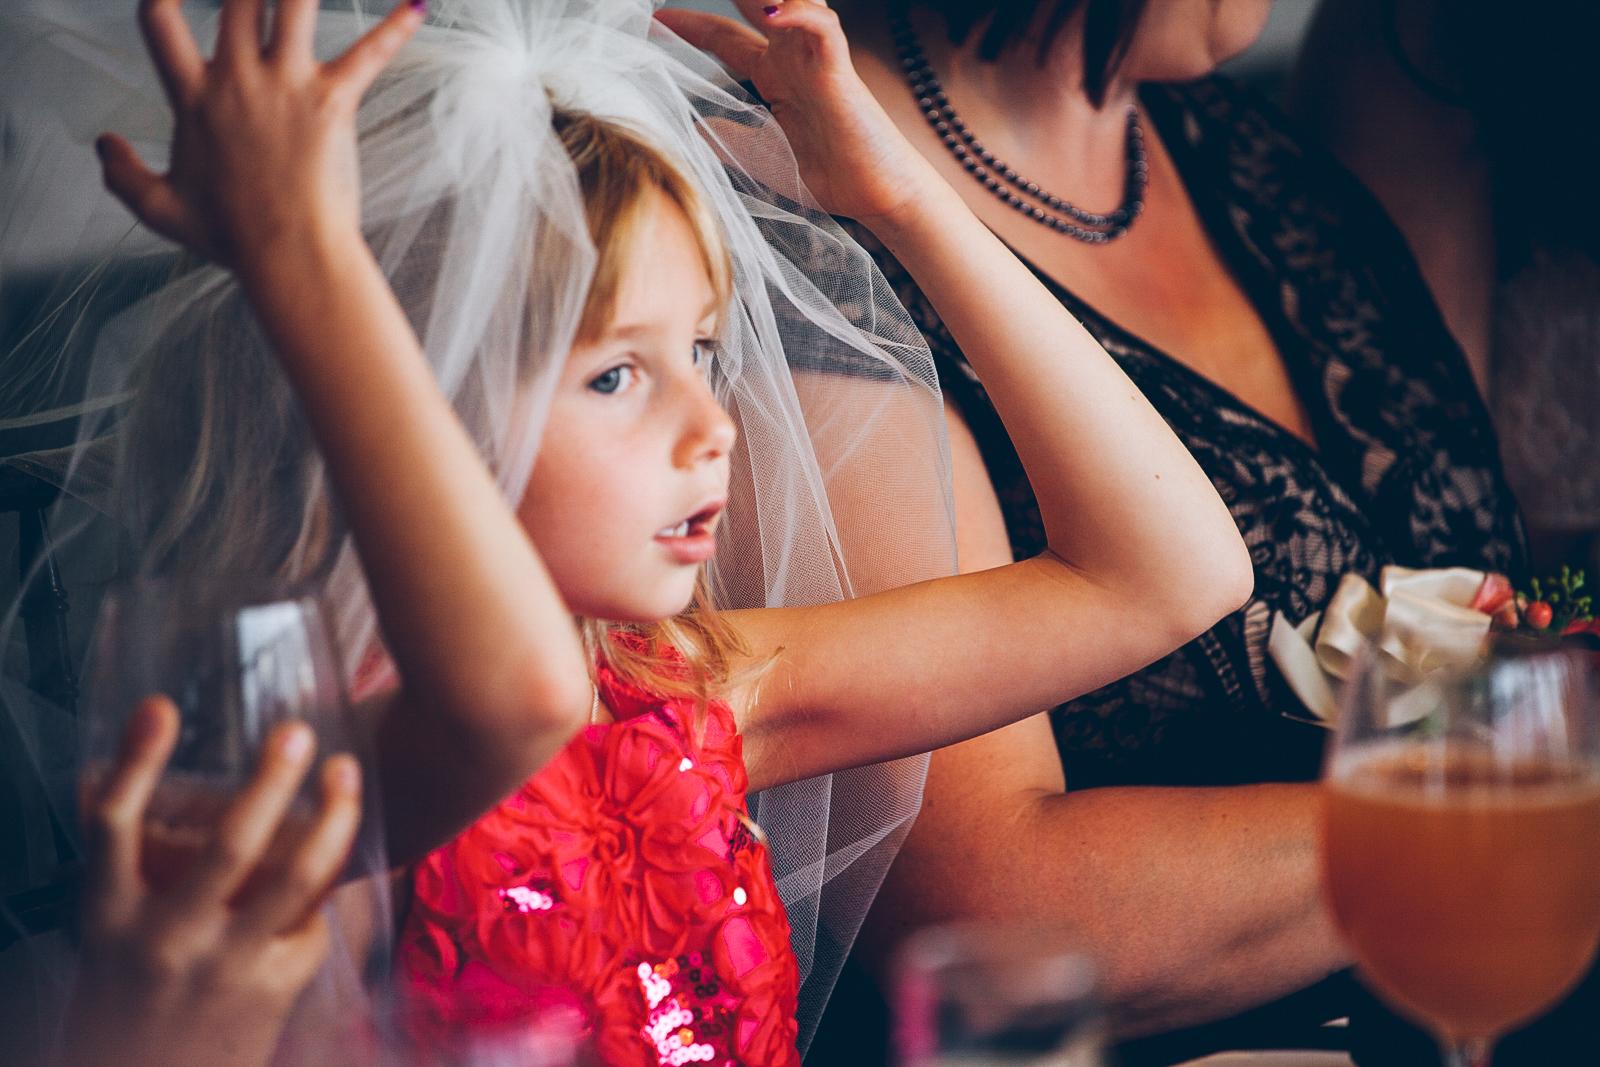 San_francisco_city_hall_wedding_photography_meegan_travis_ebony_siovhan_bokeh_photography_75.jpg